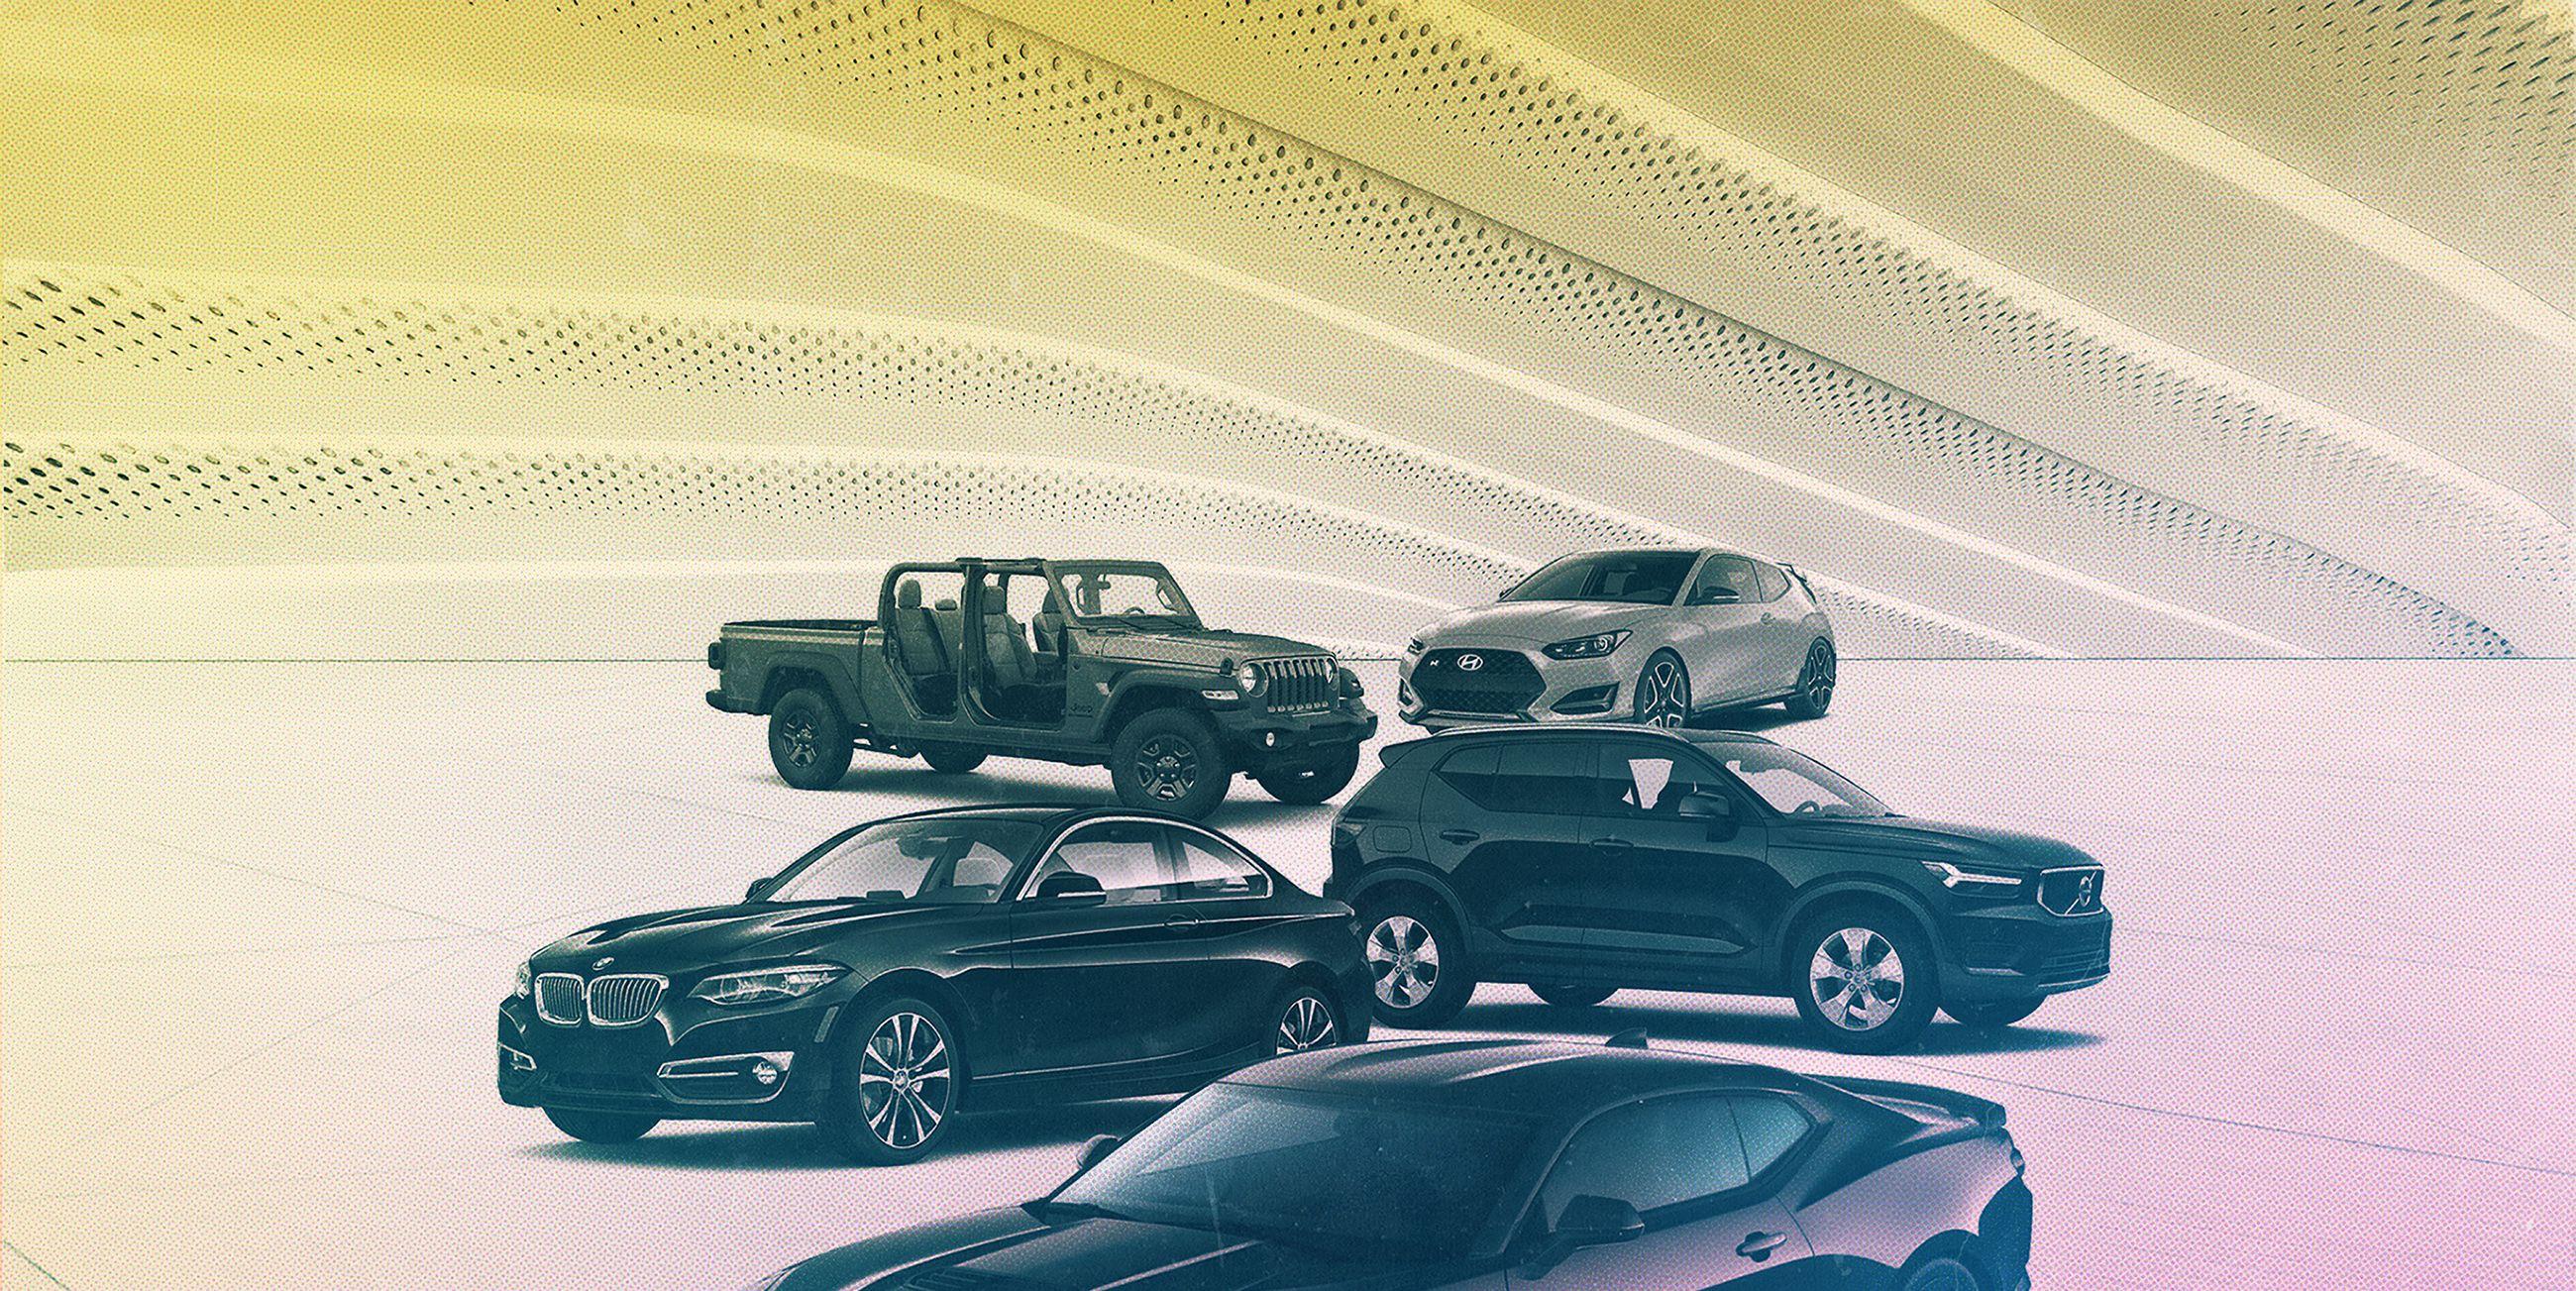 C/D Editors' Picks at the Average New Car Price